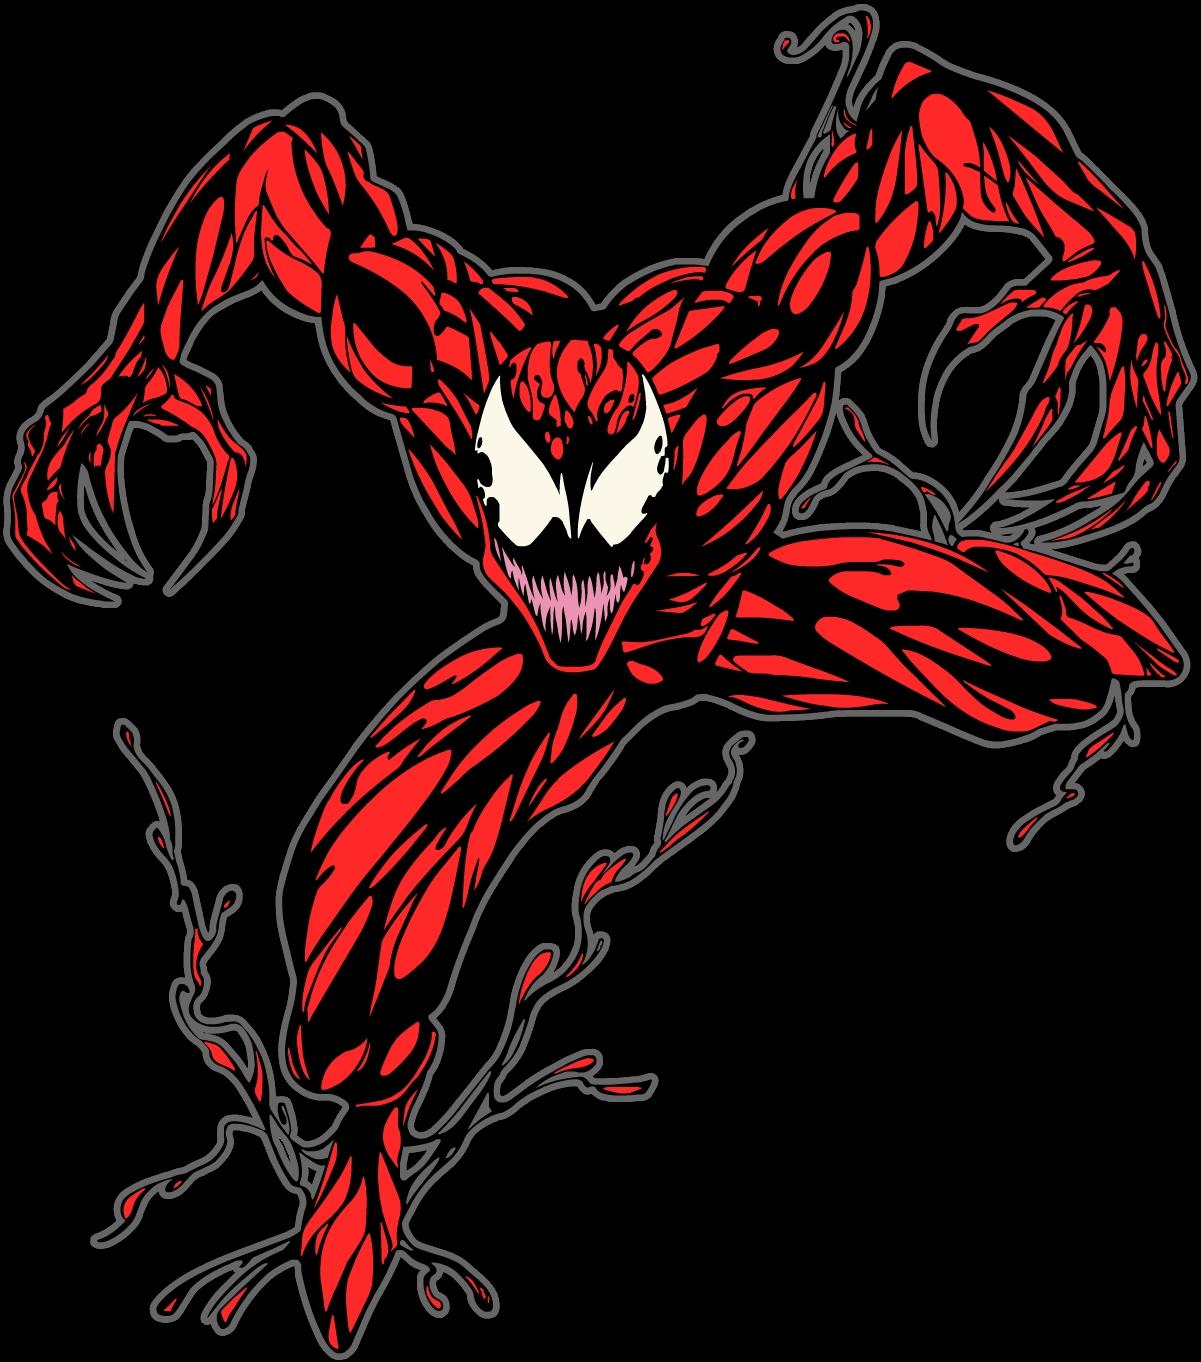 Carnage (Marvel) | Villains Wiki | FANDOM powered by Wikia